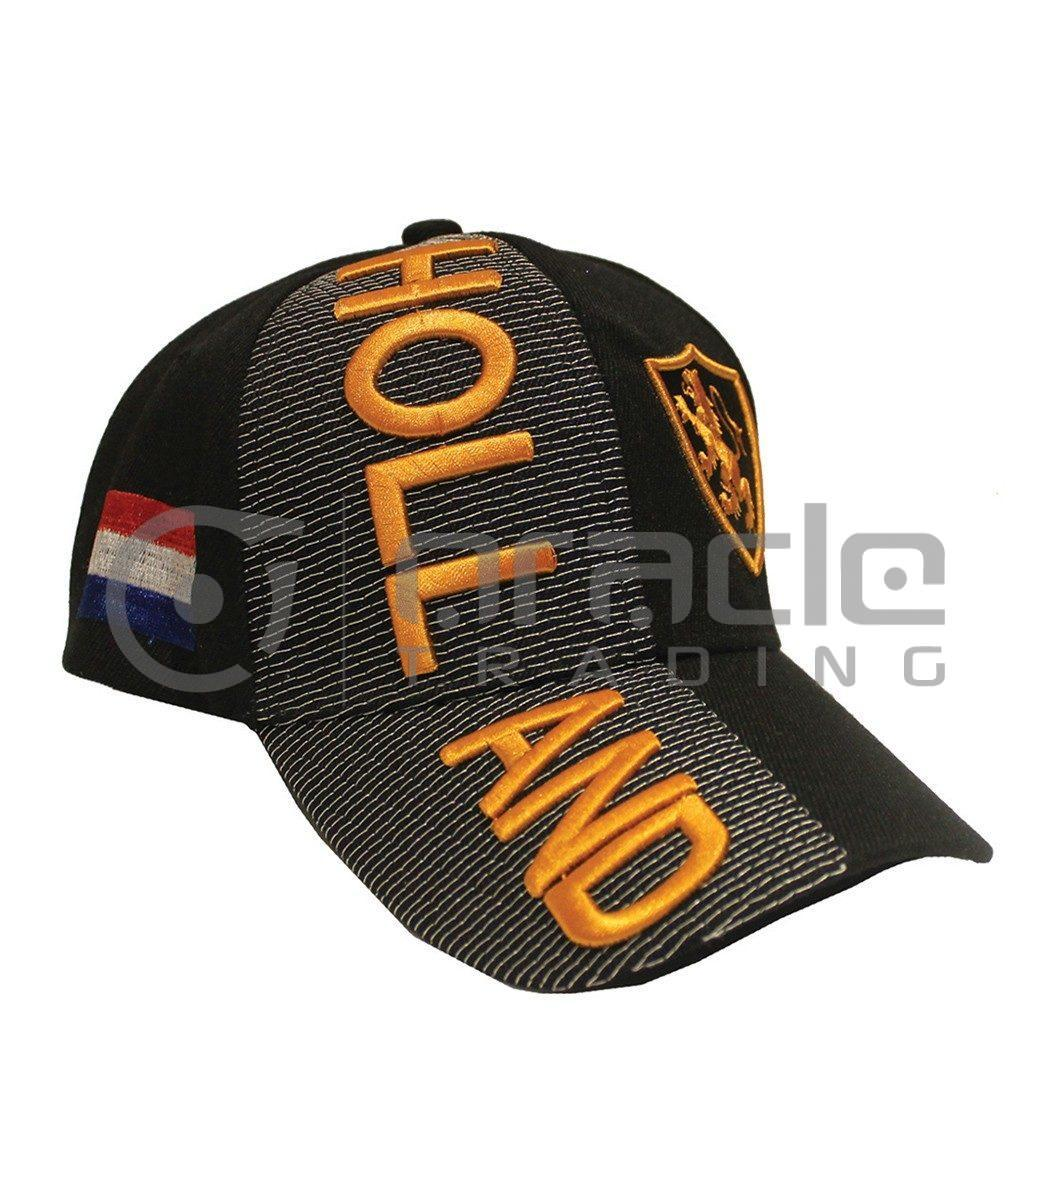 3D Holland Hat - Black